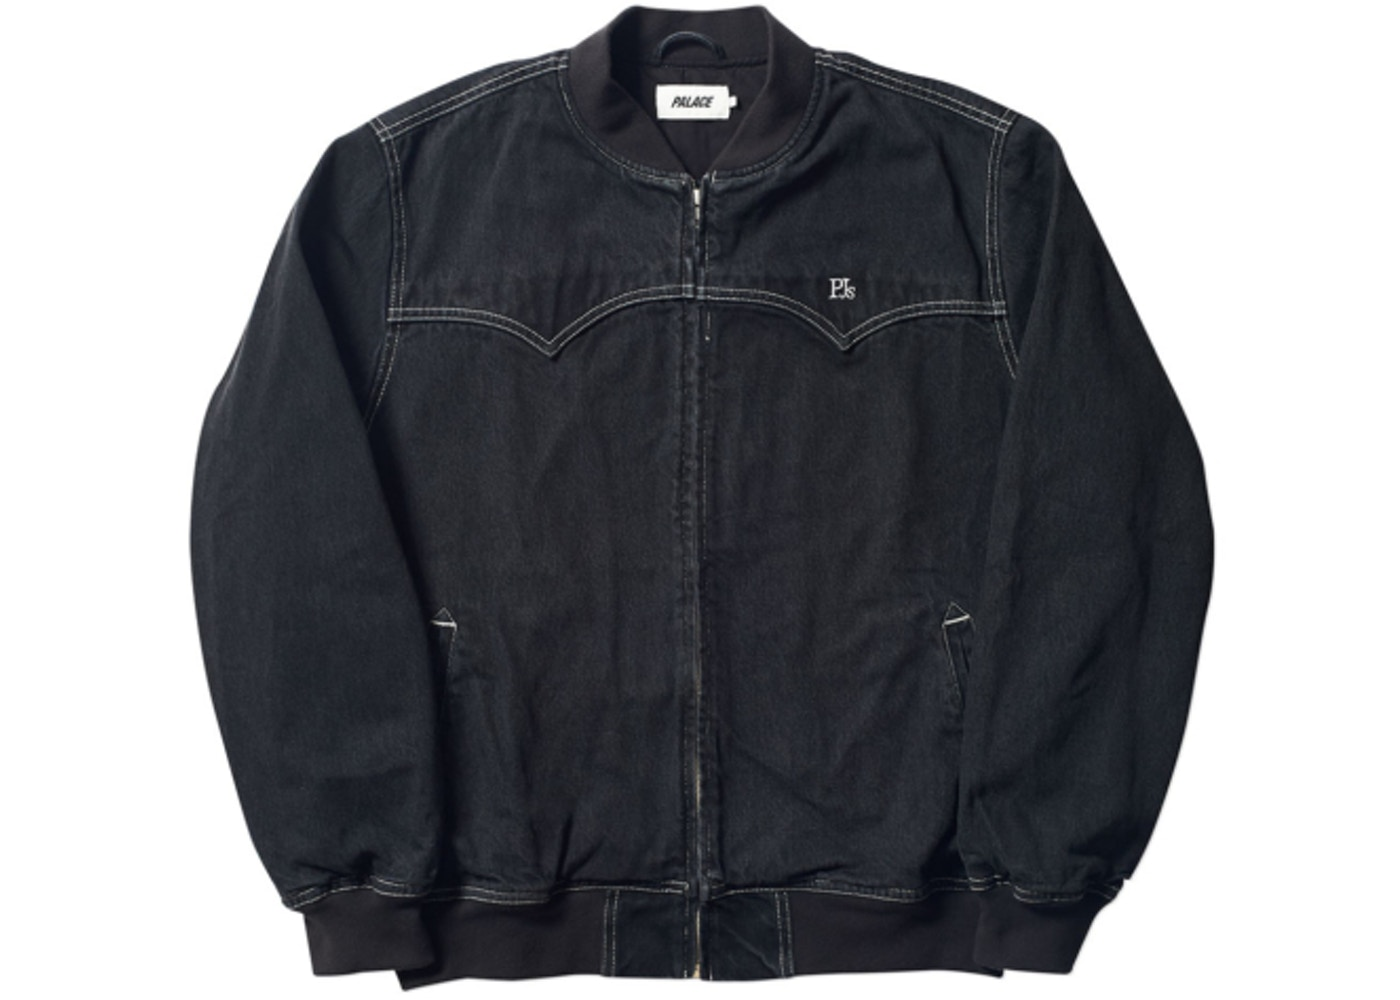 1e57f2114 Palace Jeans Bomber Black Stone Wash